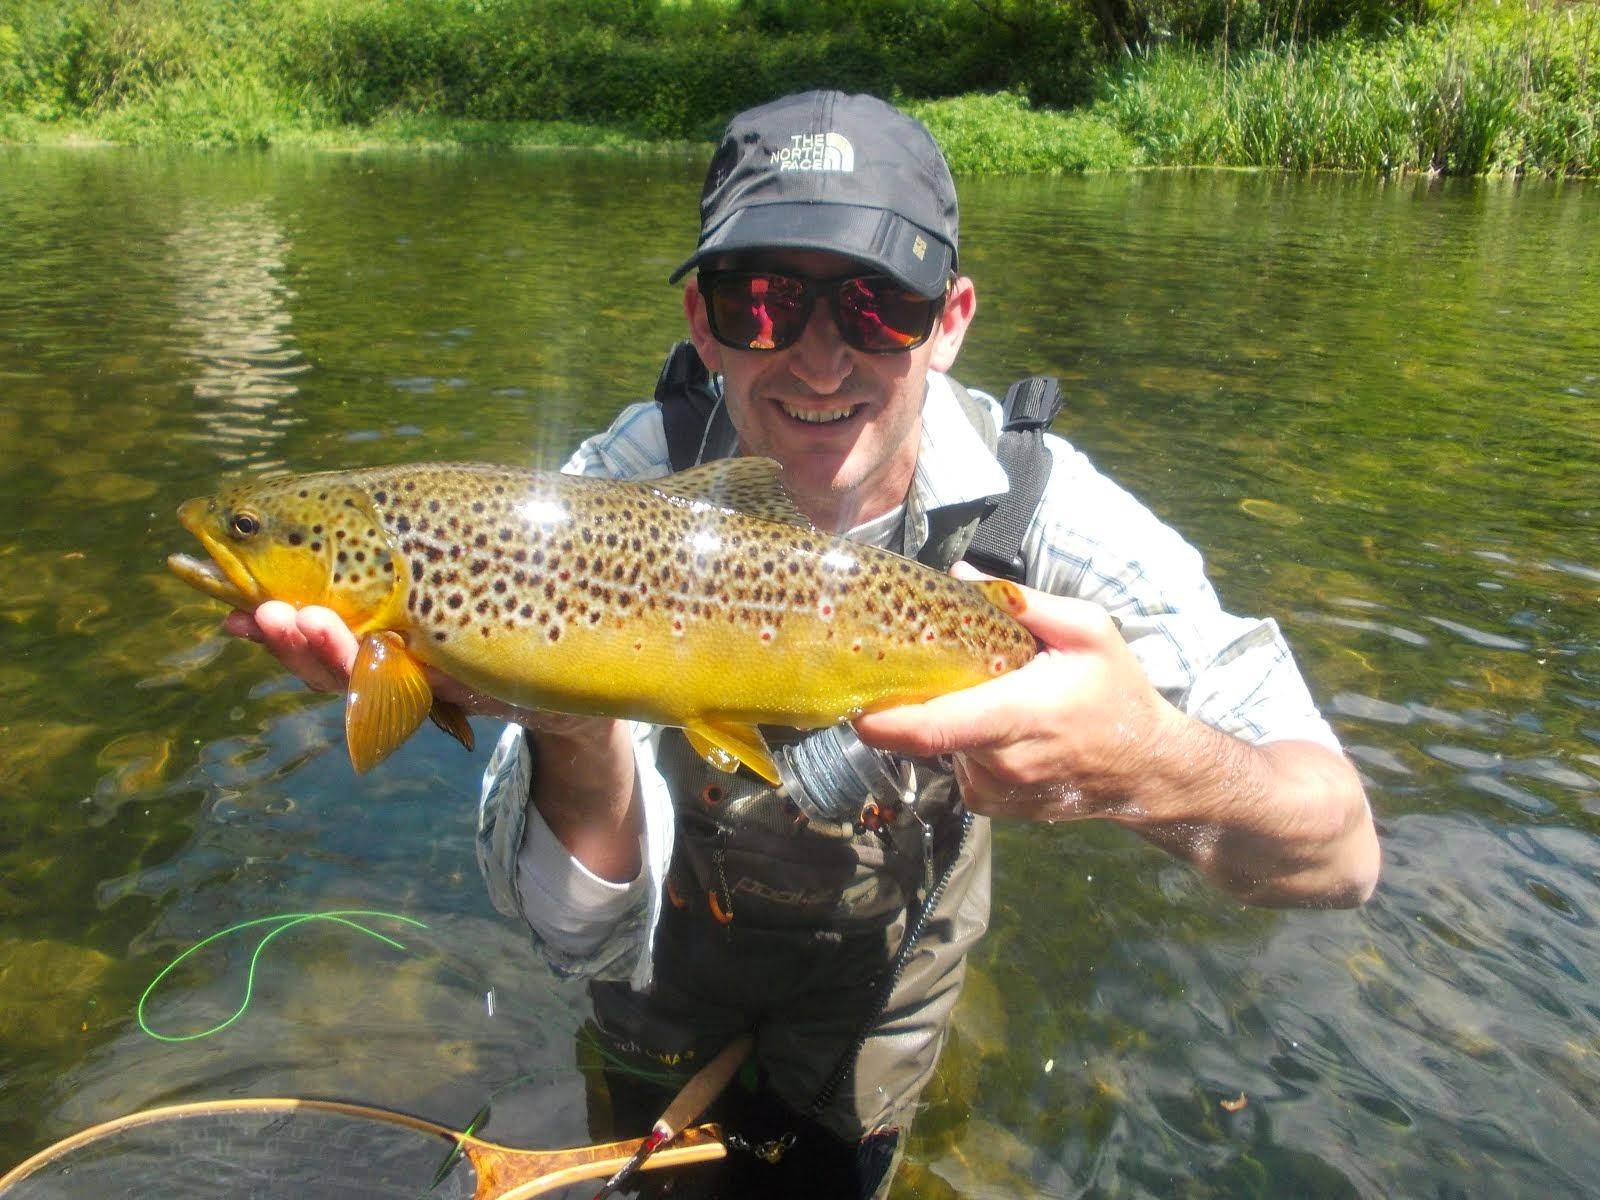 Rubinsteinfishing el blog de pesca de ferran oliva i poch for Como criar truchas en estanques